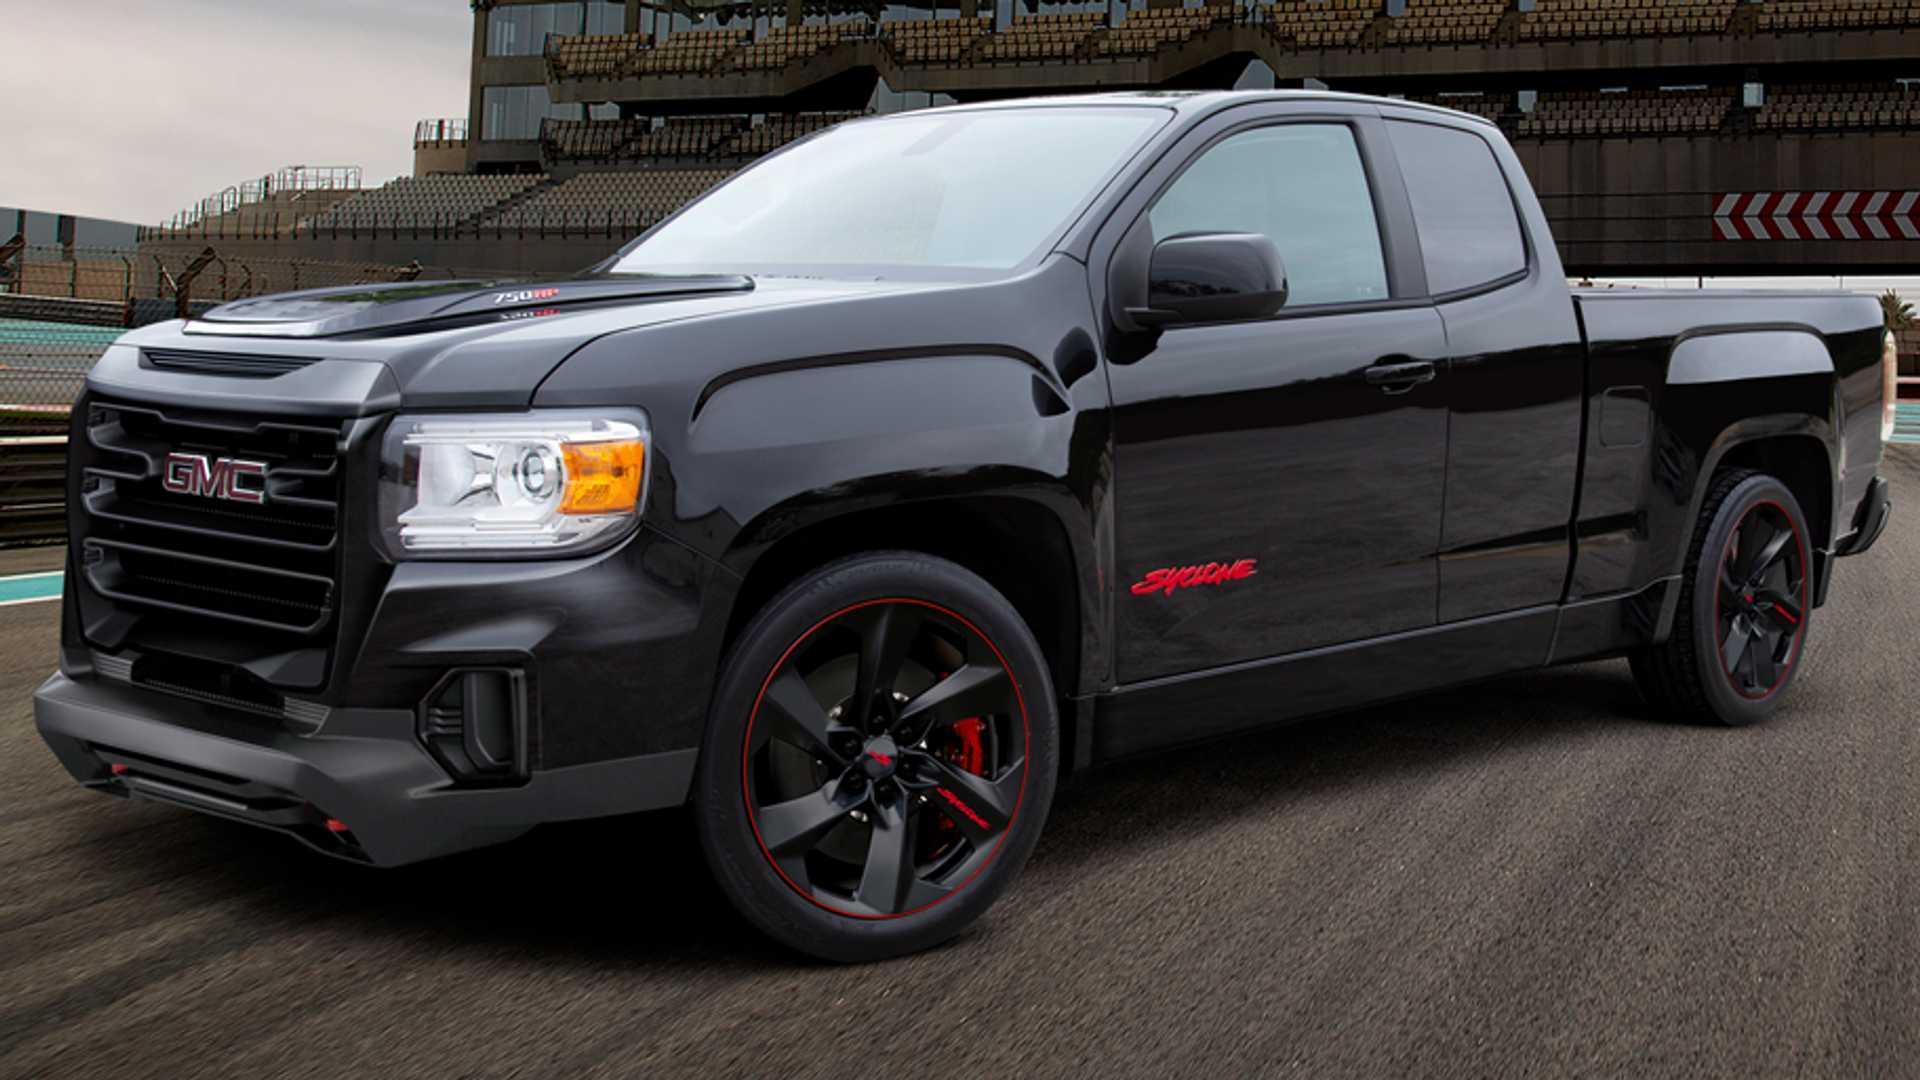 2014 - [Chevrolet / GMC] Colorado / Canyon - Page 2 2021-sve-syclone